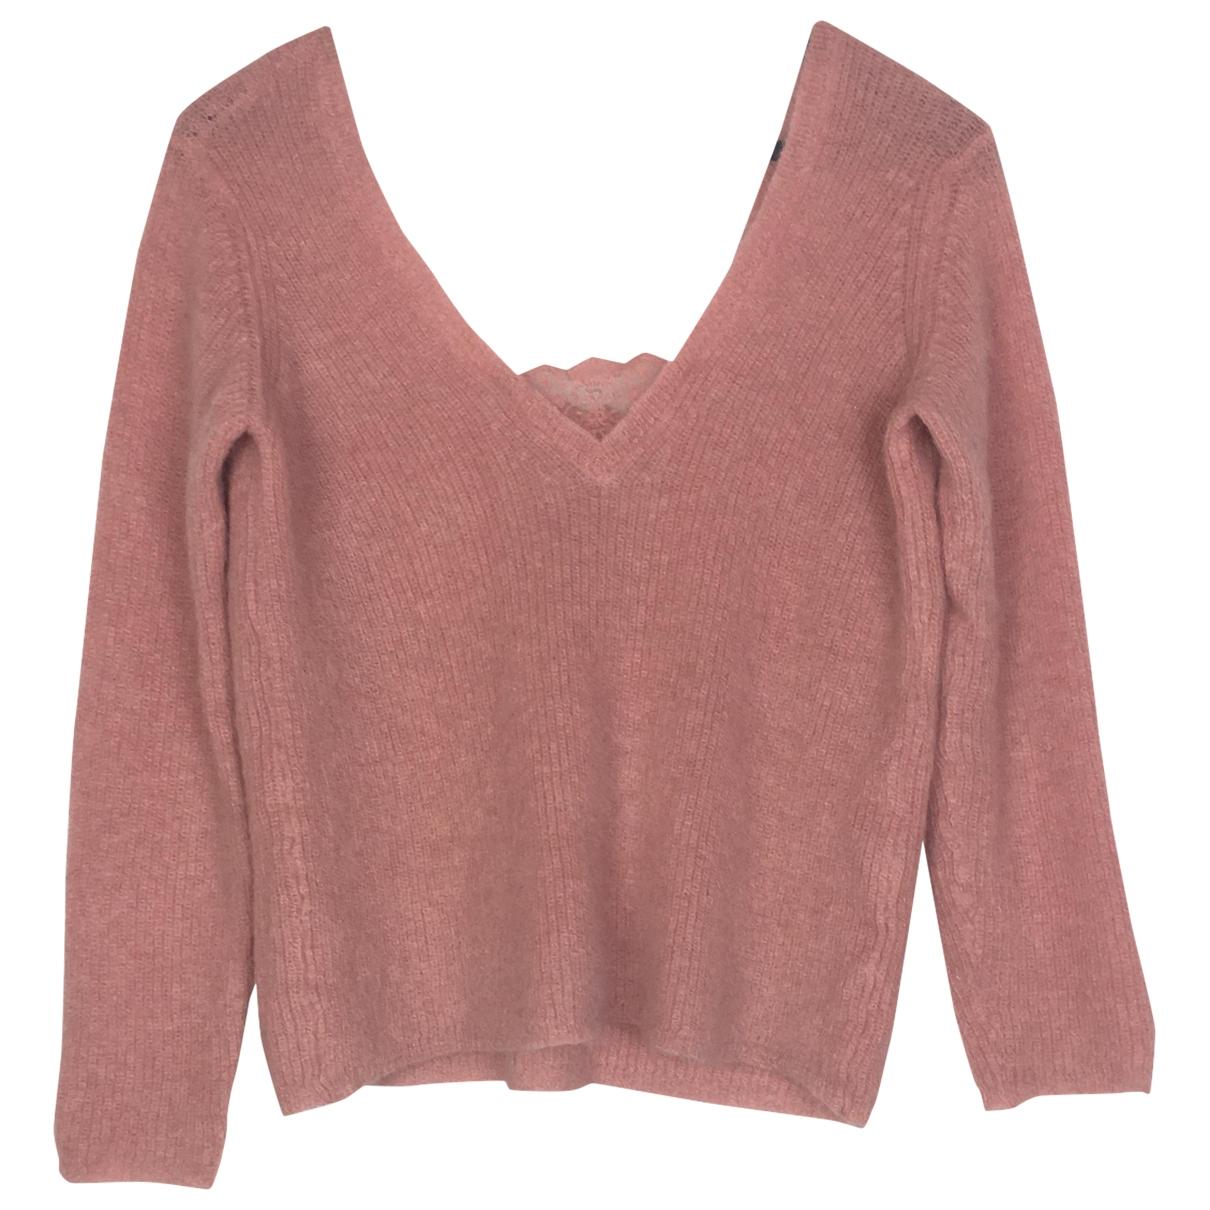 Sezane - Pull   pour femme en laine - rose